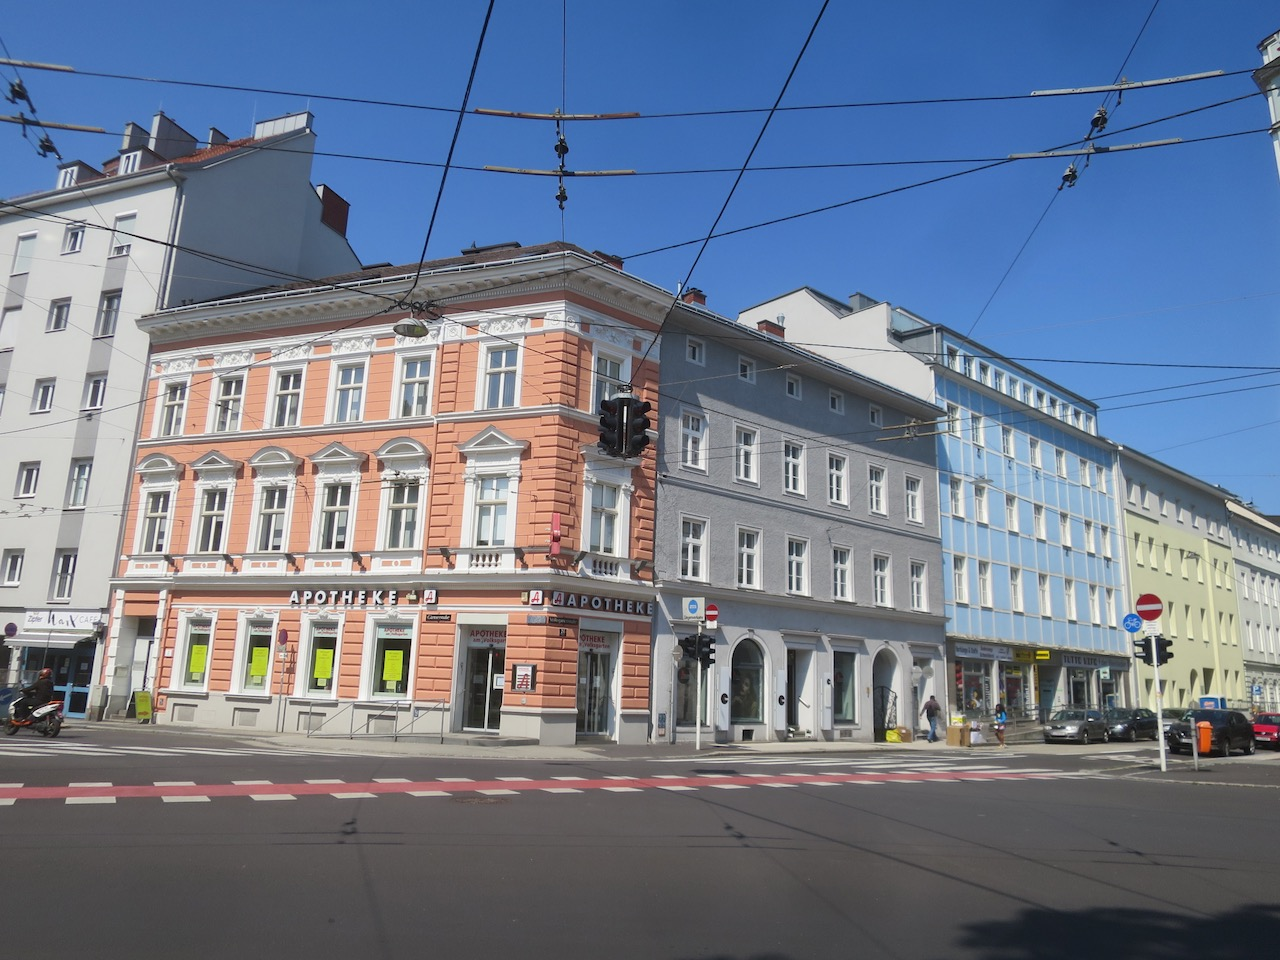 Linz 1 06